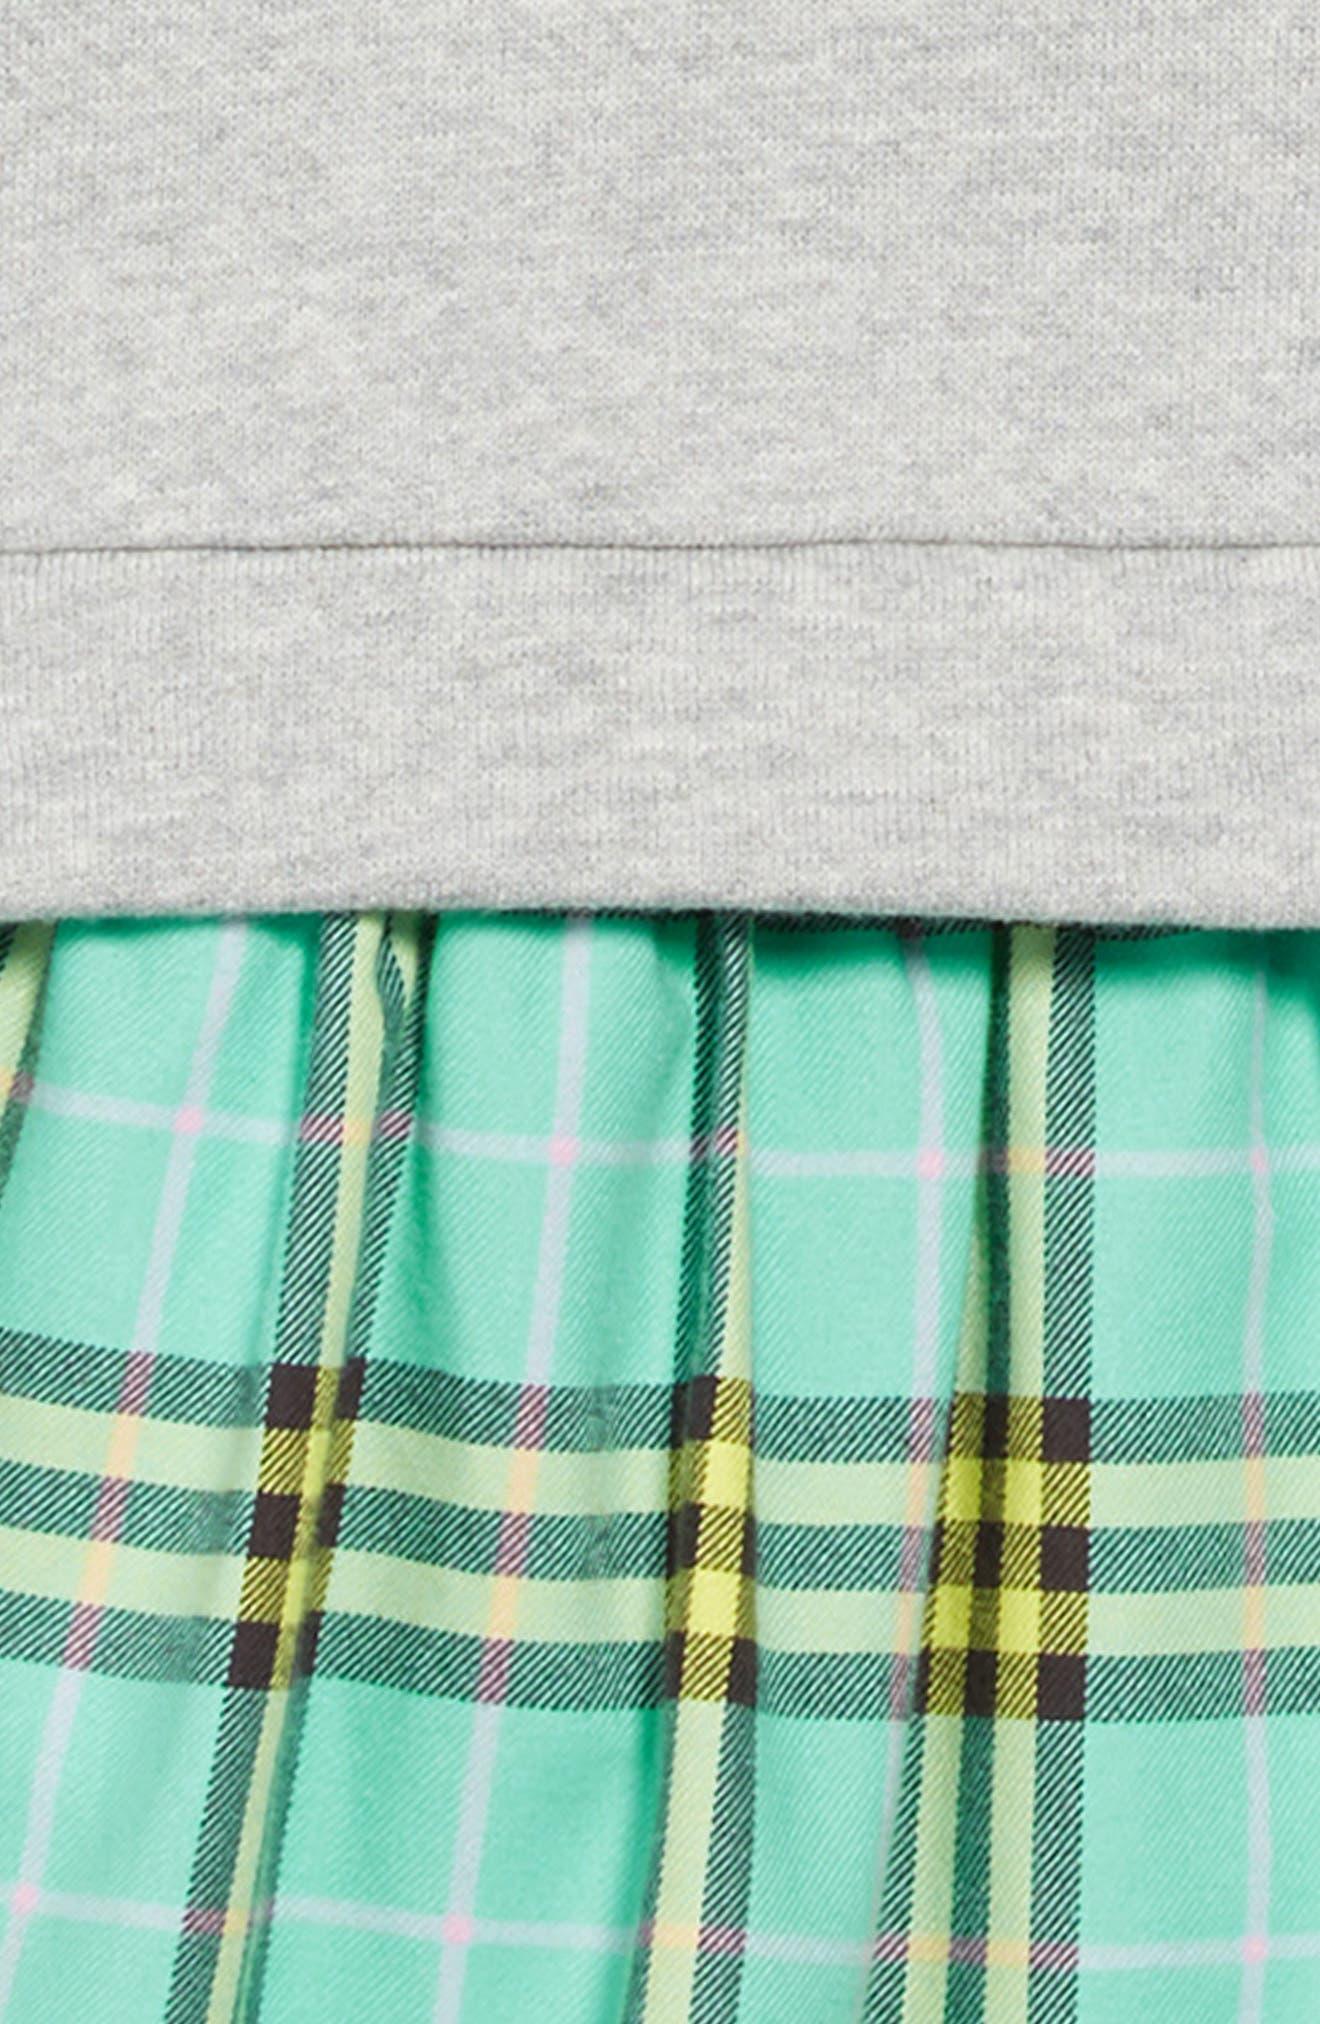 Francine Popover Dress,                             Alternate thumbnail 3, color,                             BRIGHT TURQUOISE CHECK